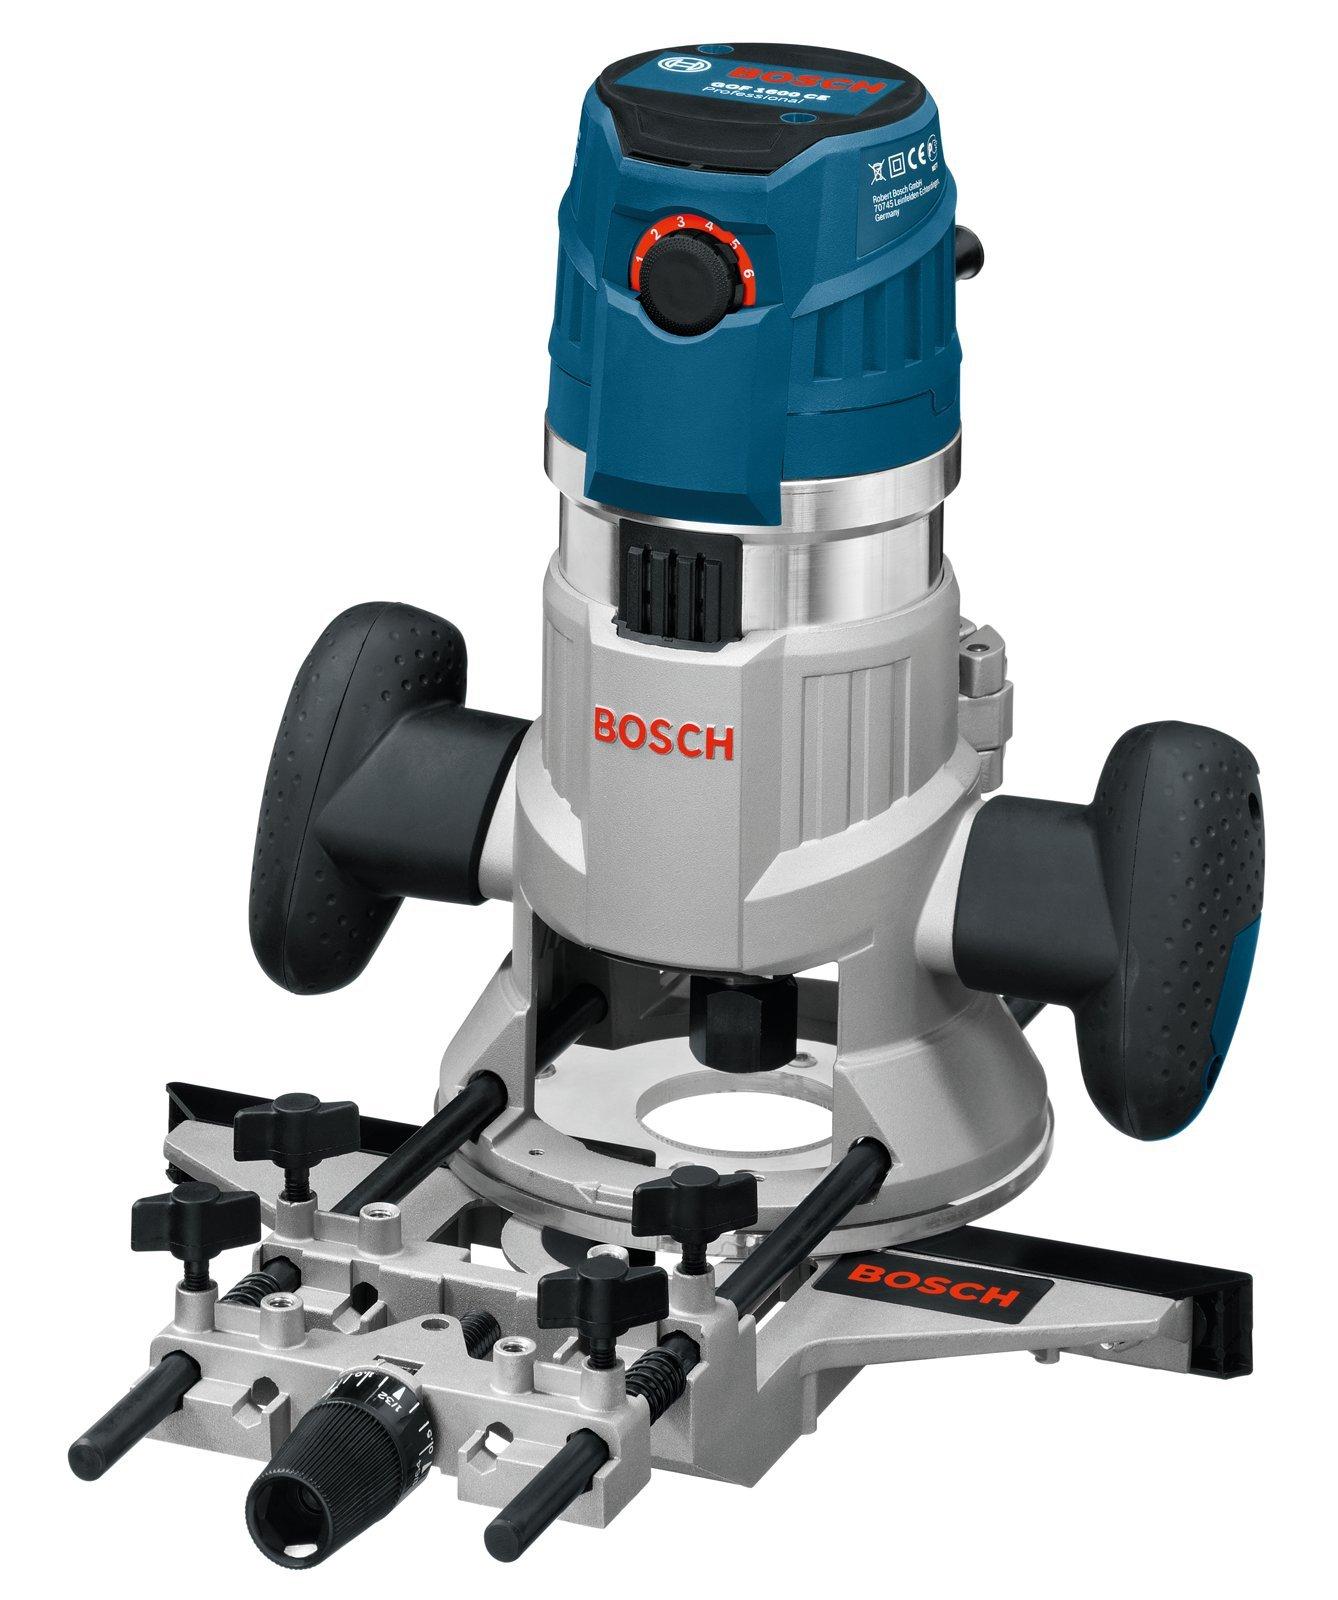 Bosch Professional GMF 1600 CE